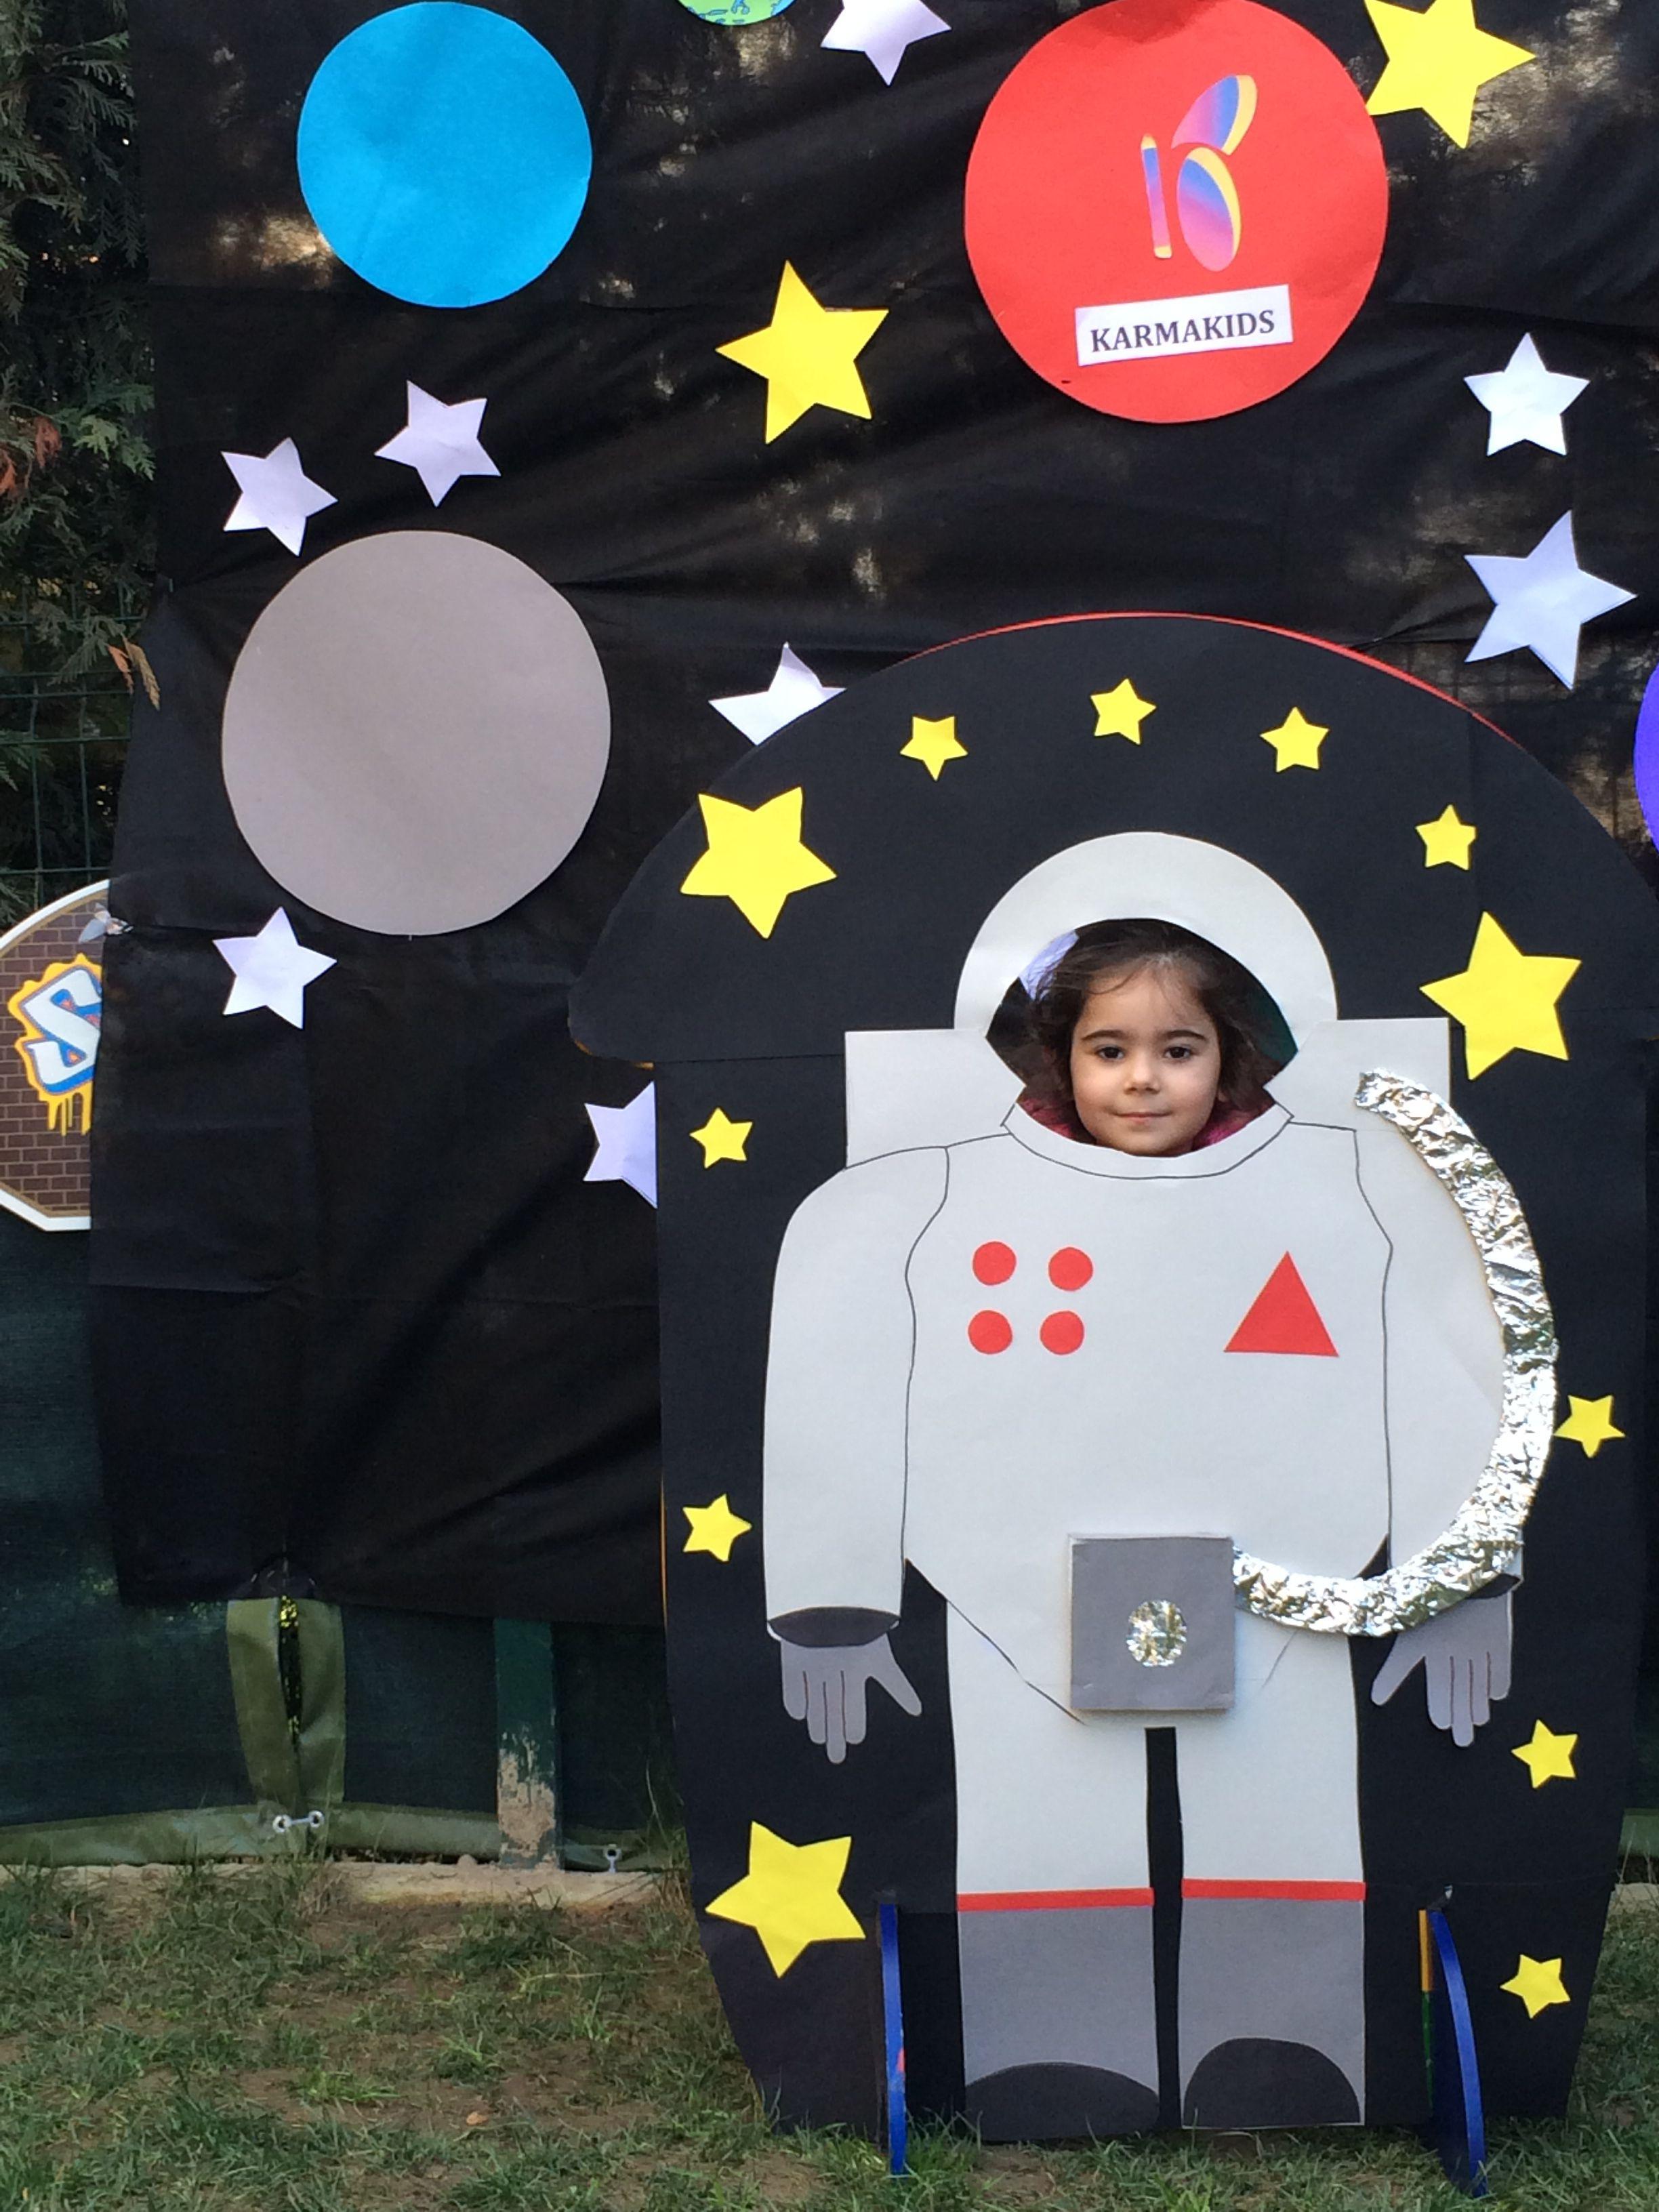 Space Theme For Kindergarten And Preschool Diy Ideas For